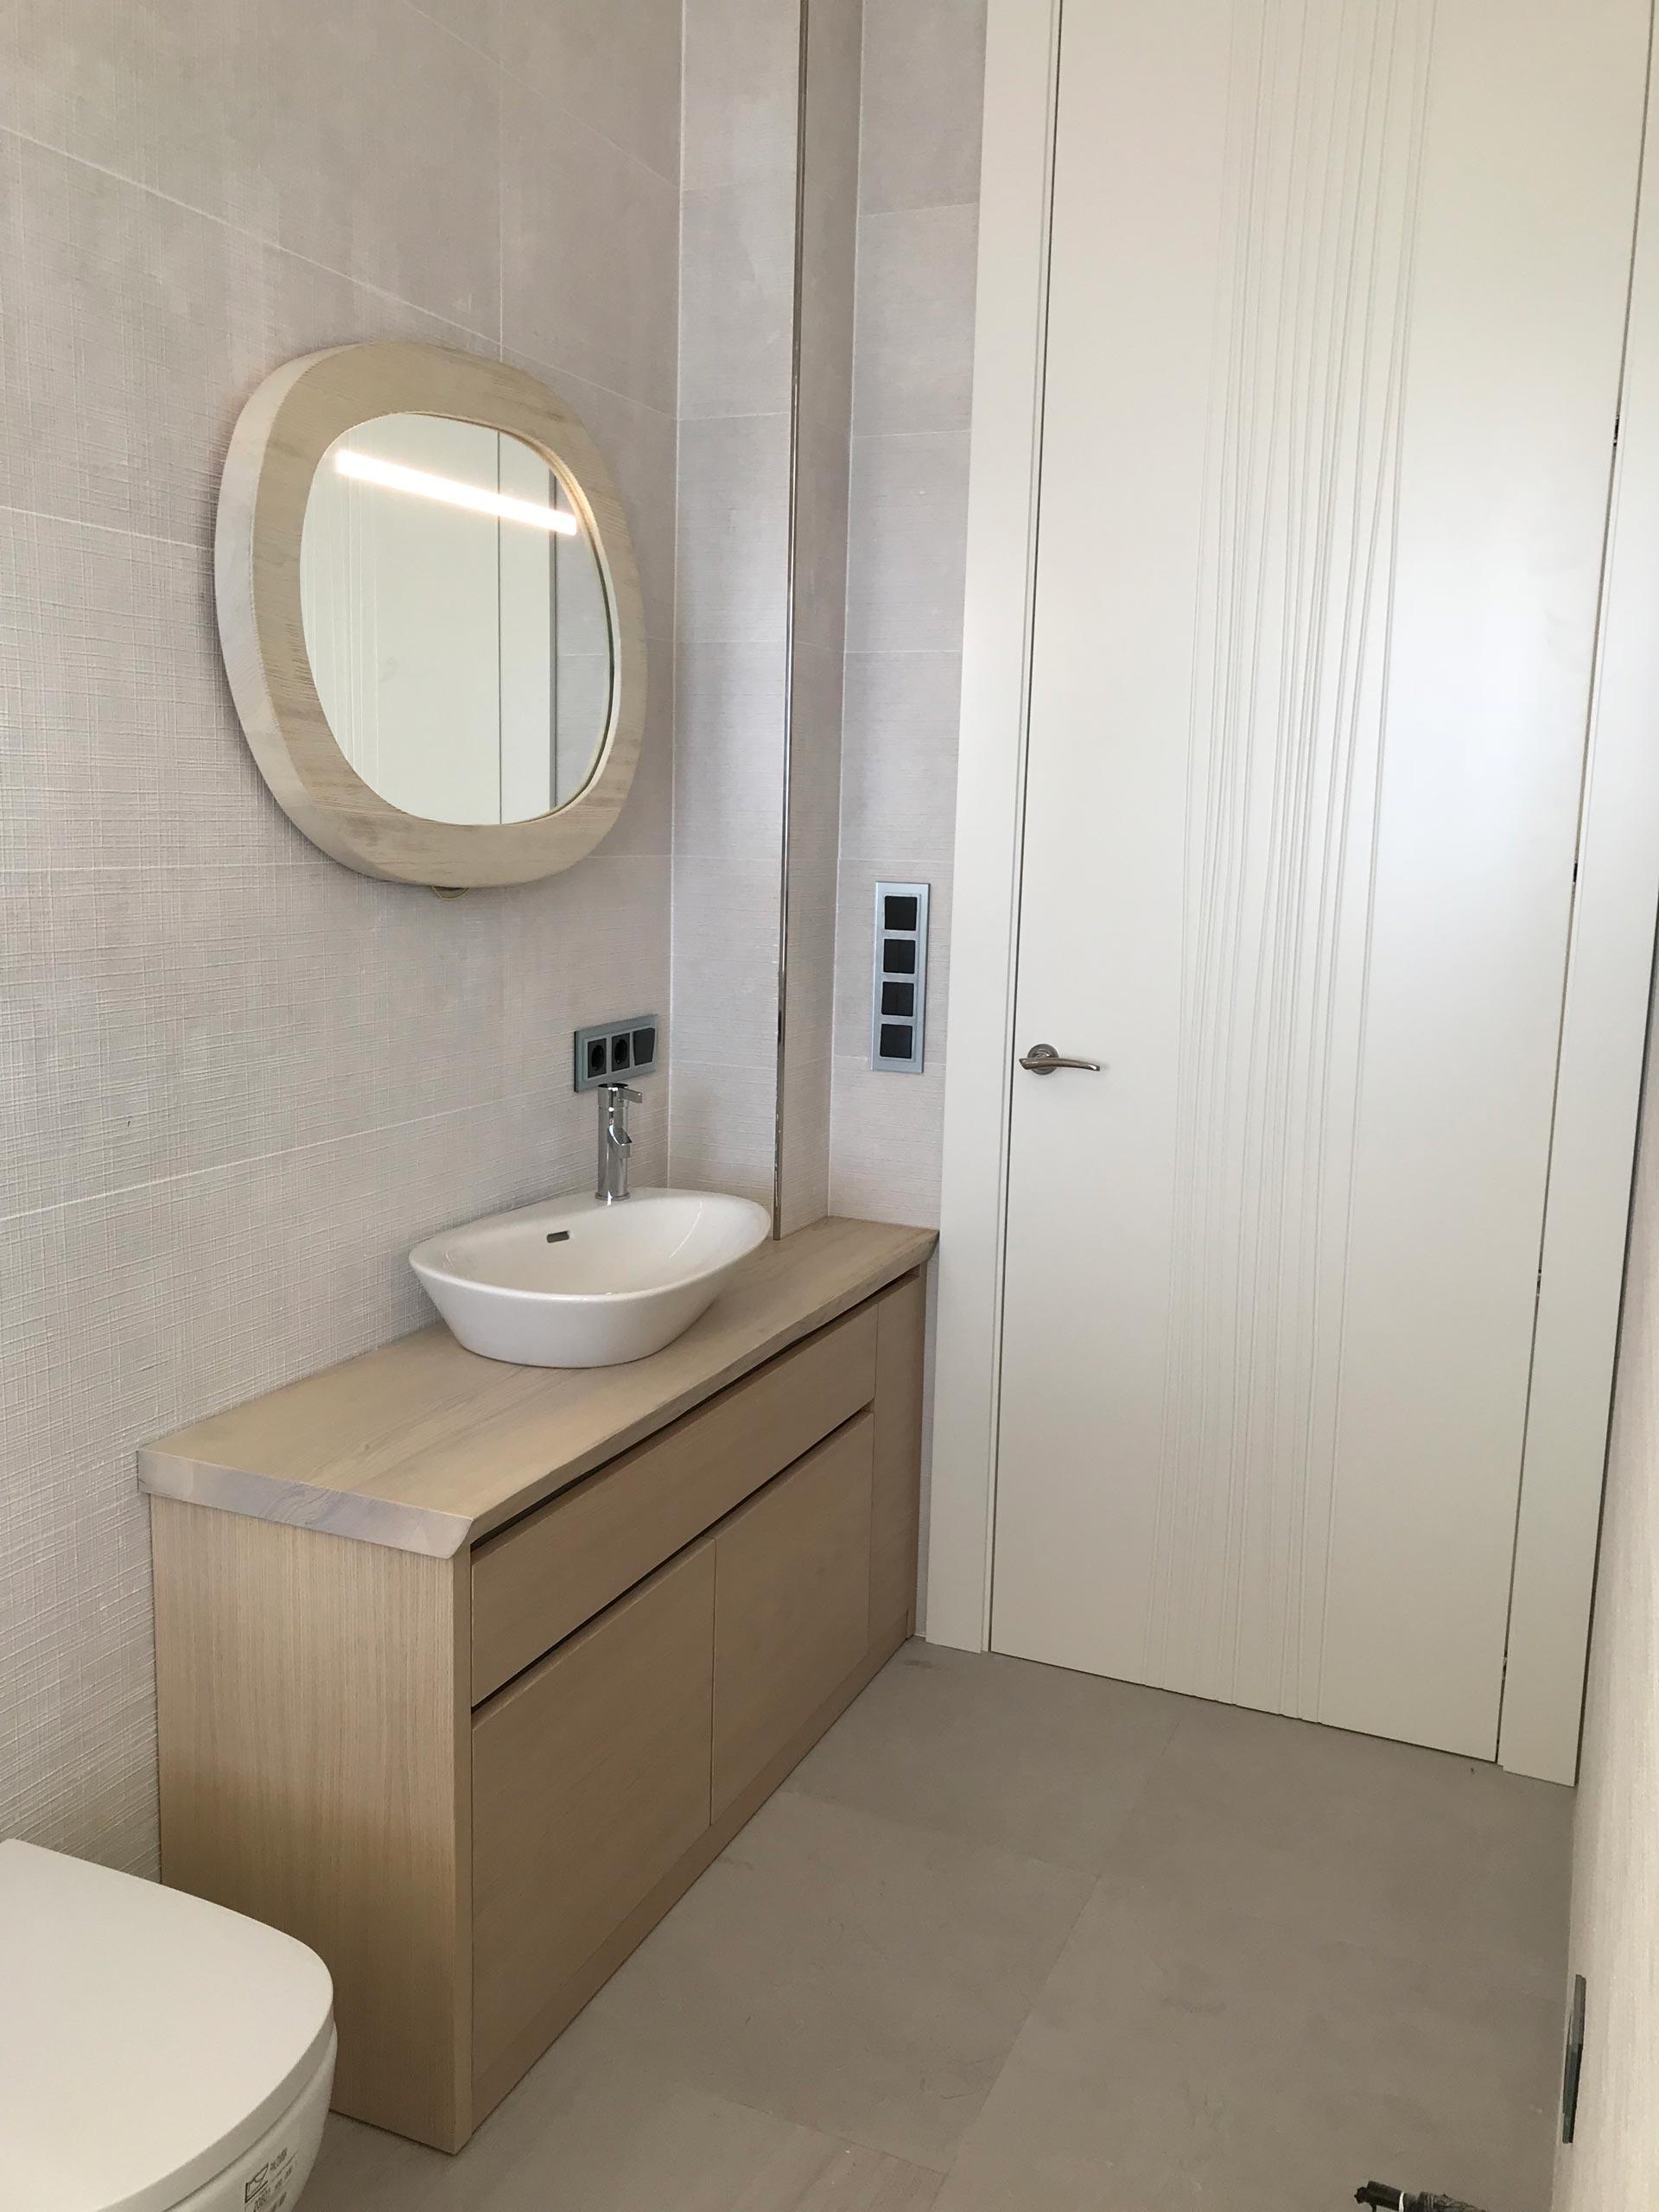 Empresas fabrica fabricacion cuartos bano aseos a medida valencia castellon alicante 4 muebles - Muebles bano castellon ...